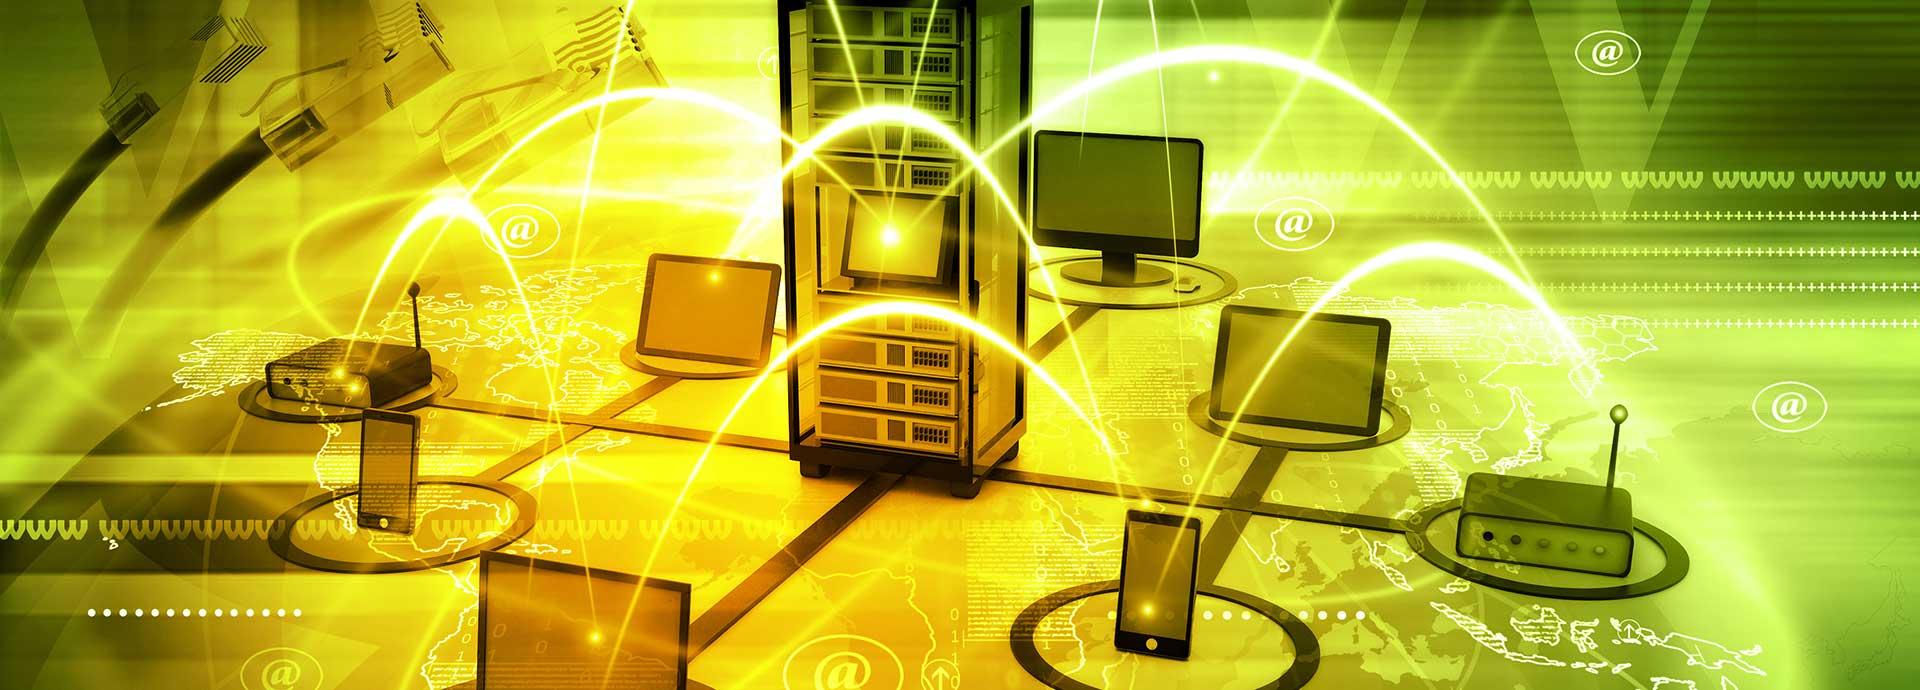 Edge computing Taking IoT beyond the cloud